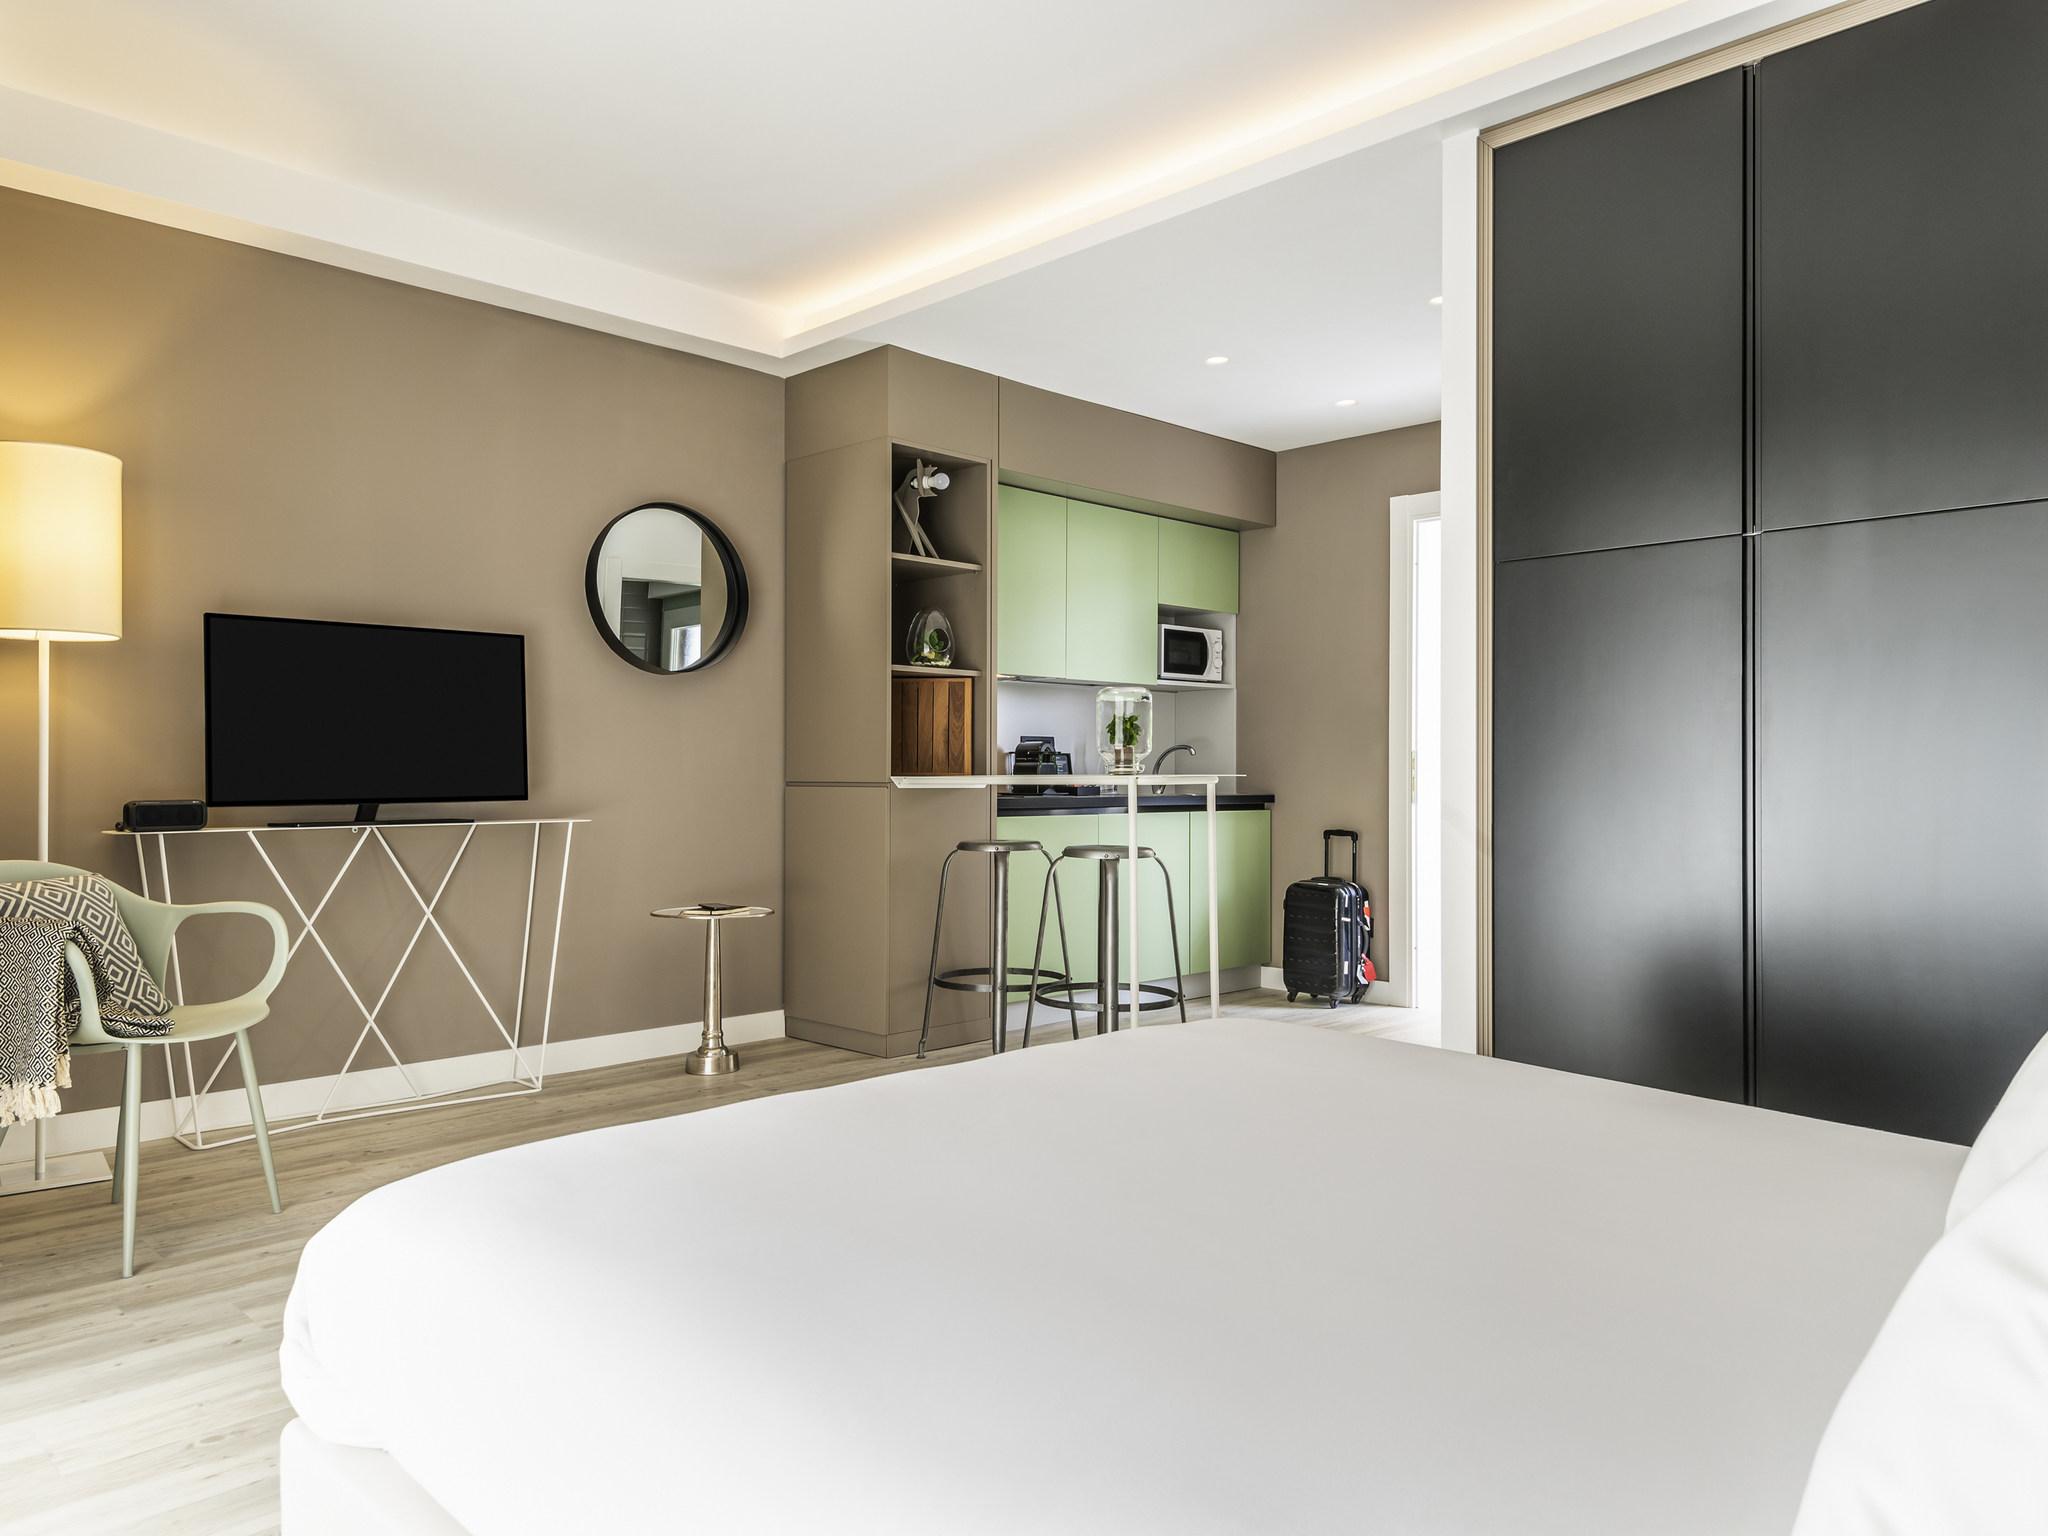 Vloerwisser Badkamer Design : Badkamer vloerwisser inspirerende trekker badkamer design trekker